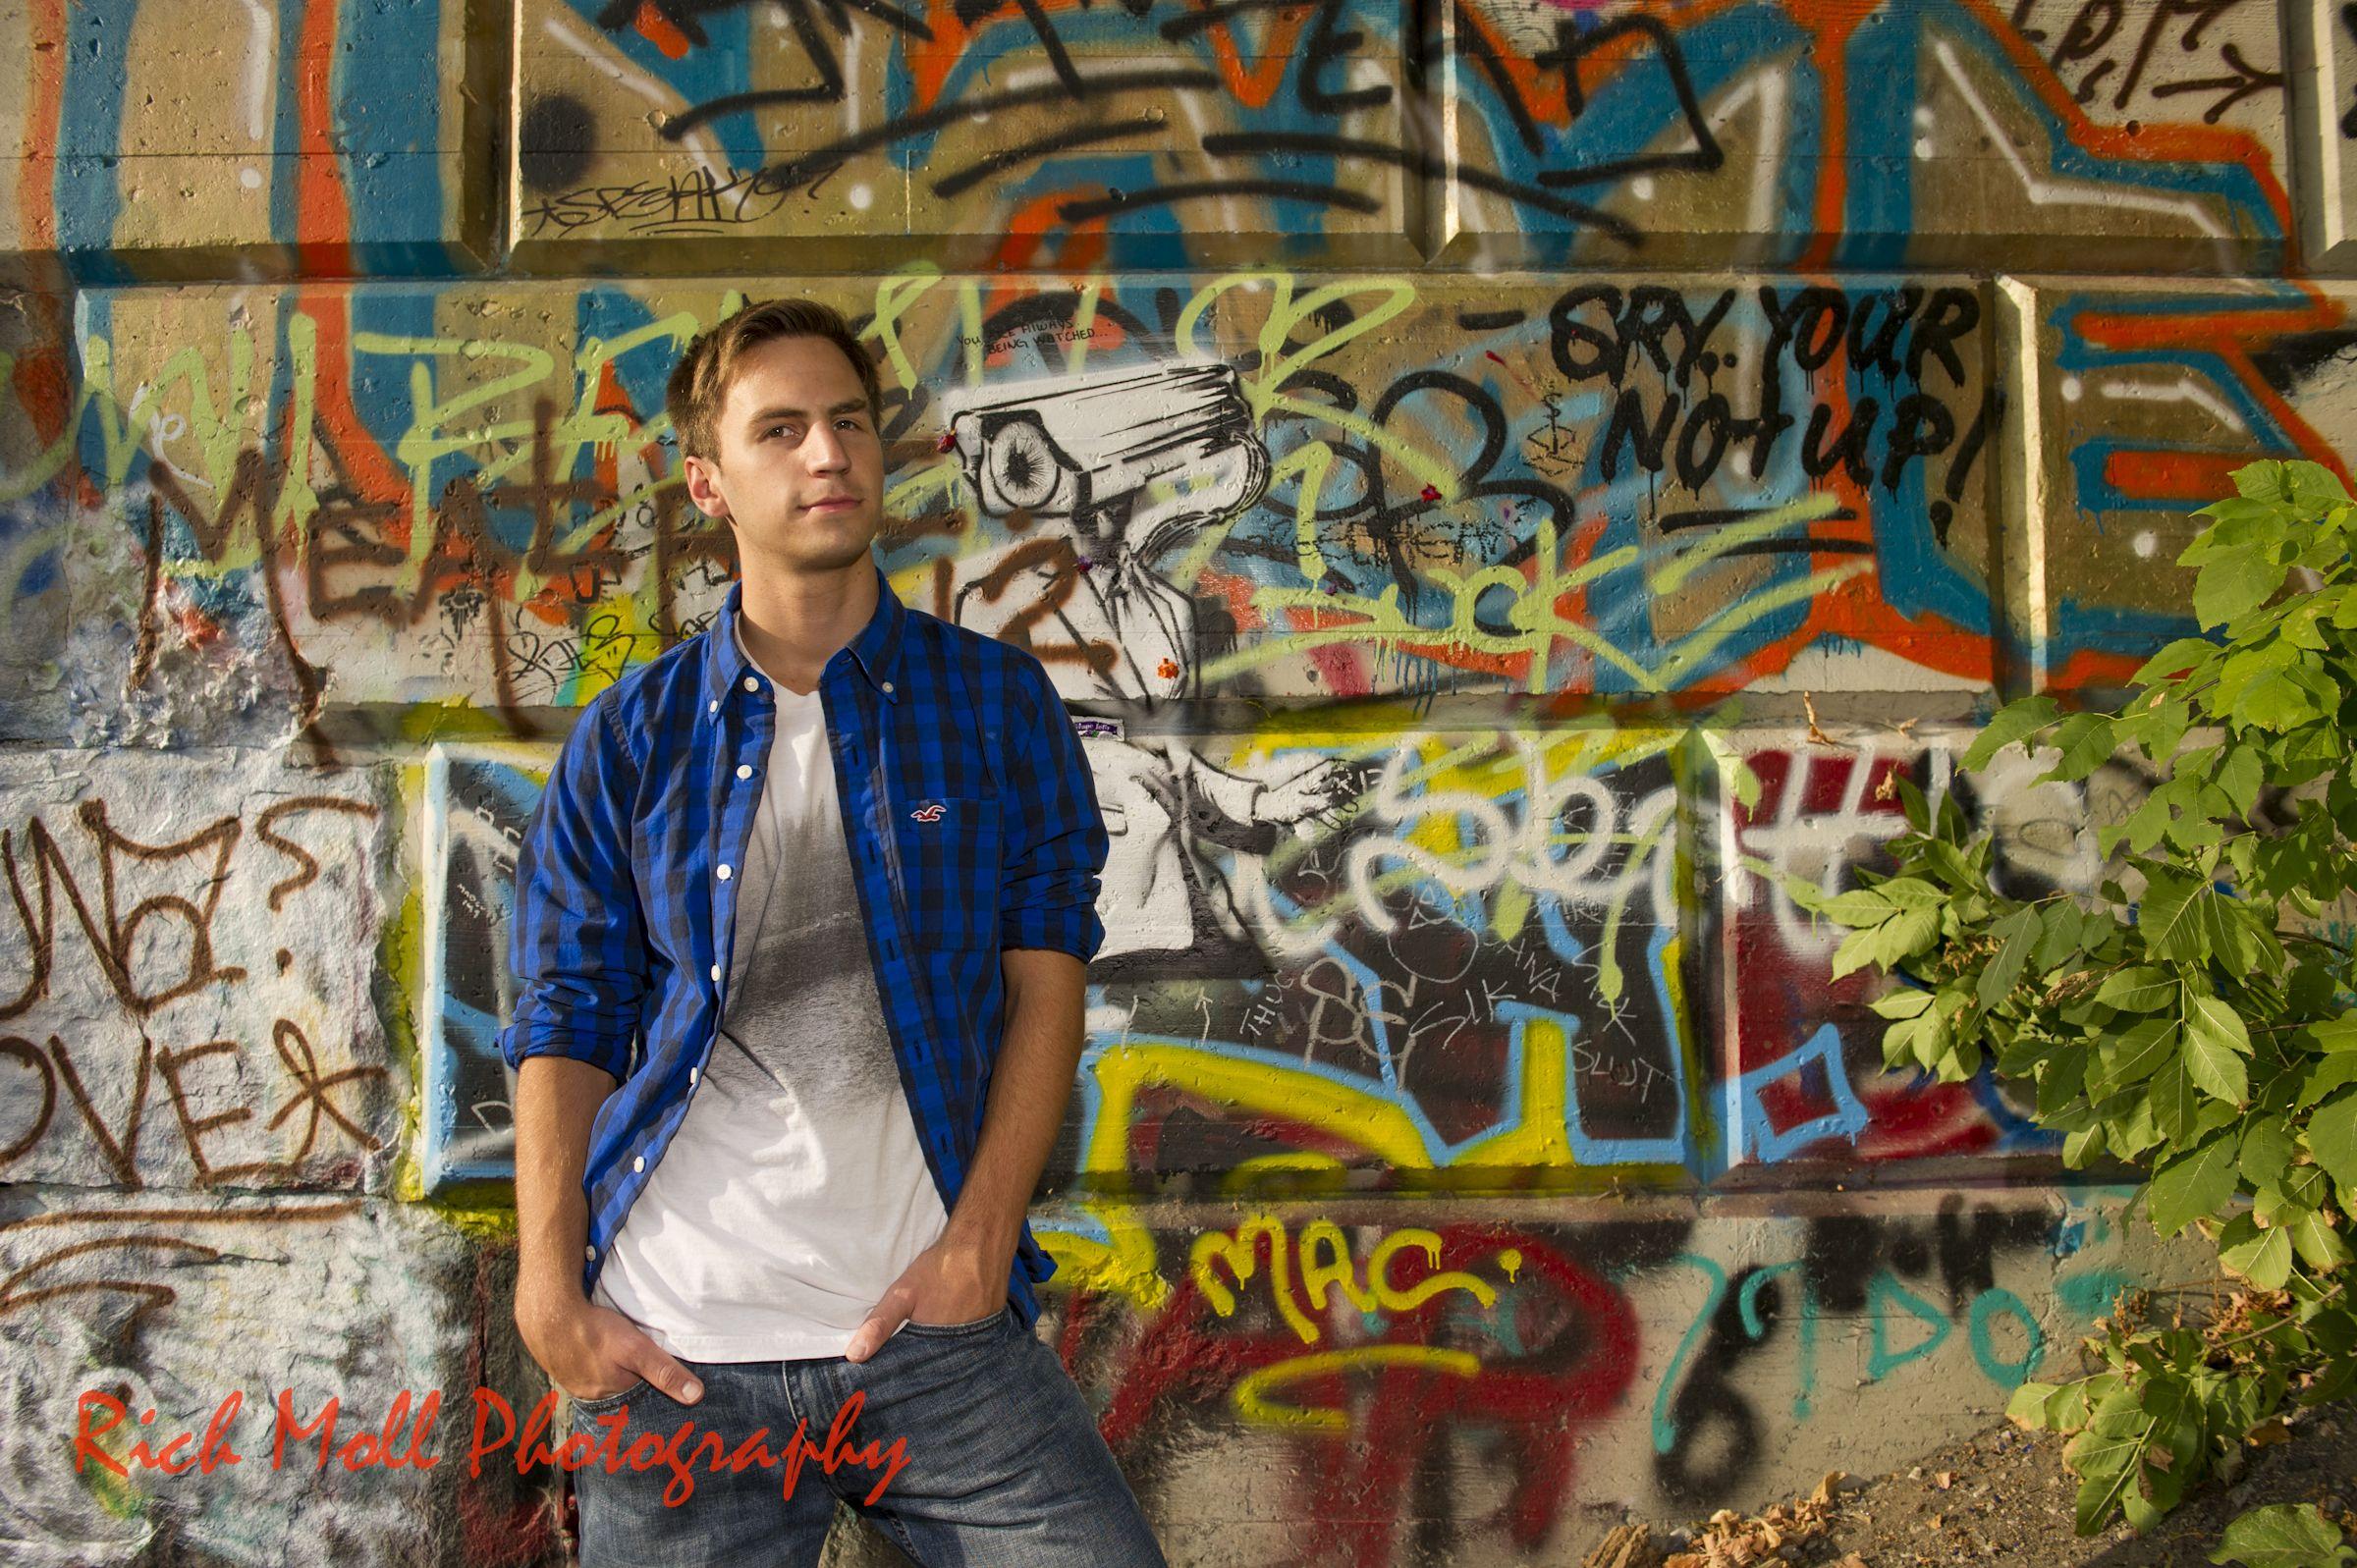 Senior pic with graffiti wall Photography senior